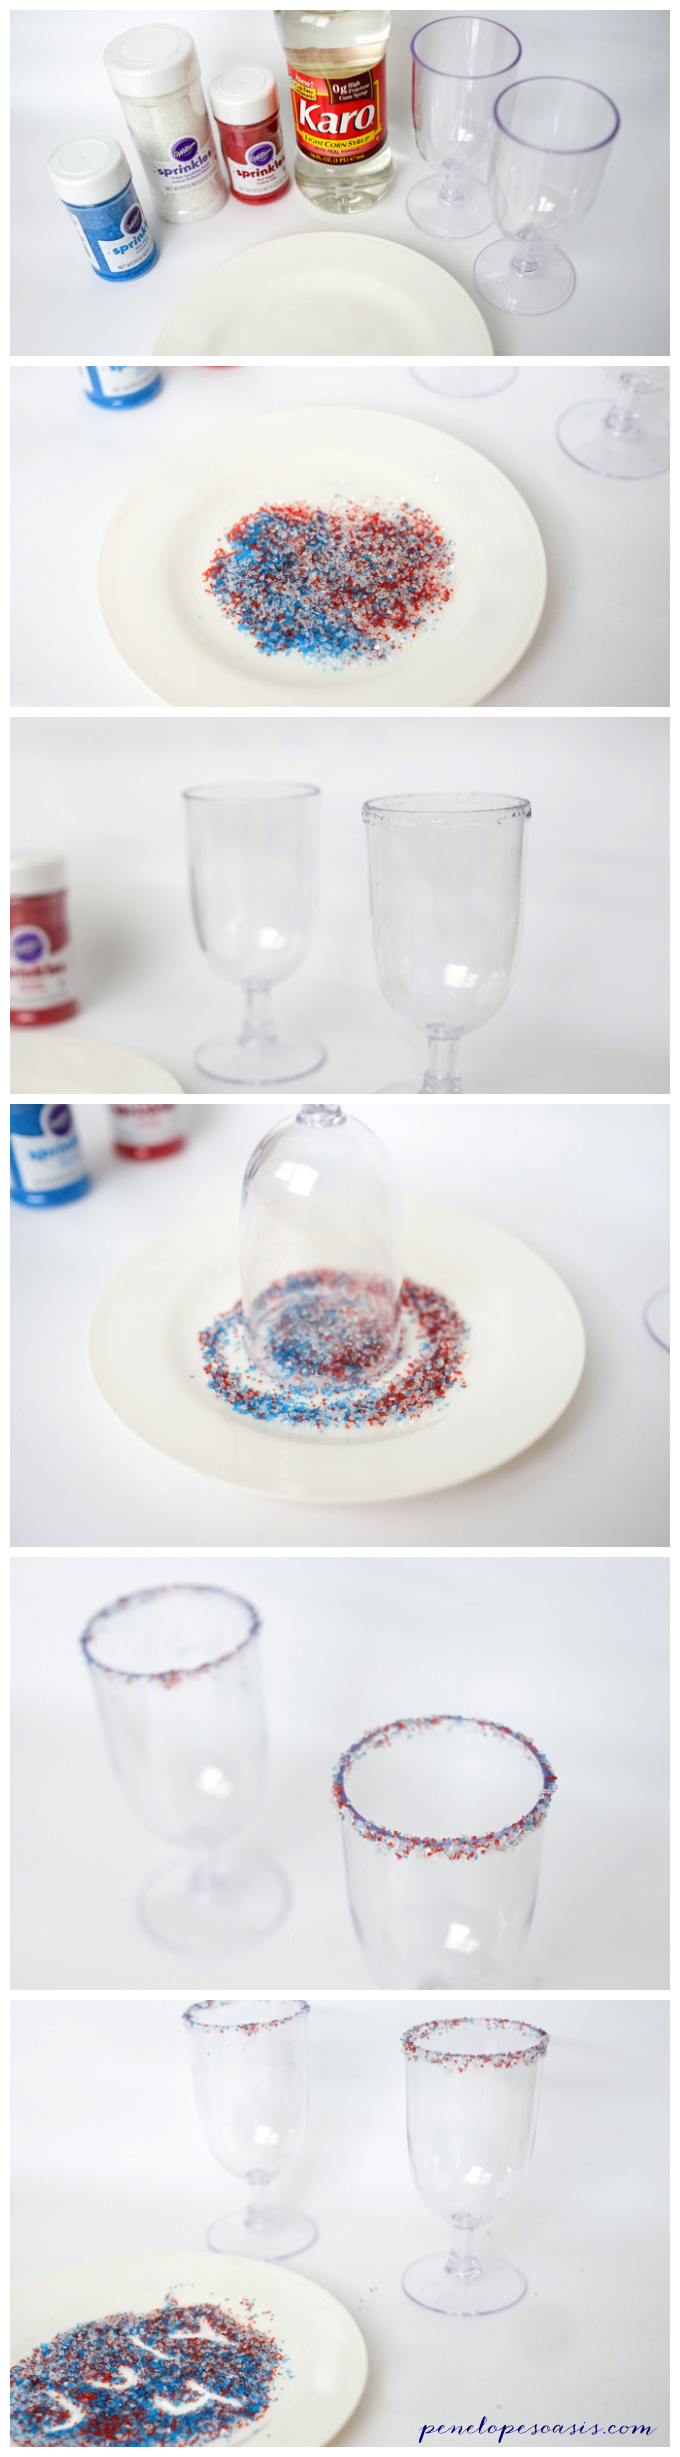 Create Sugar Rim Beverage Glass Sprinkles Craft